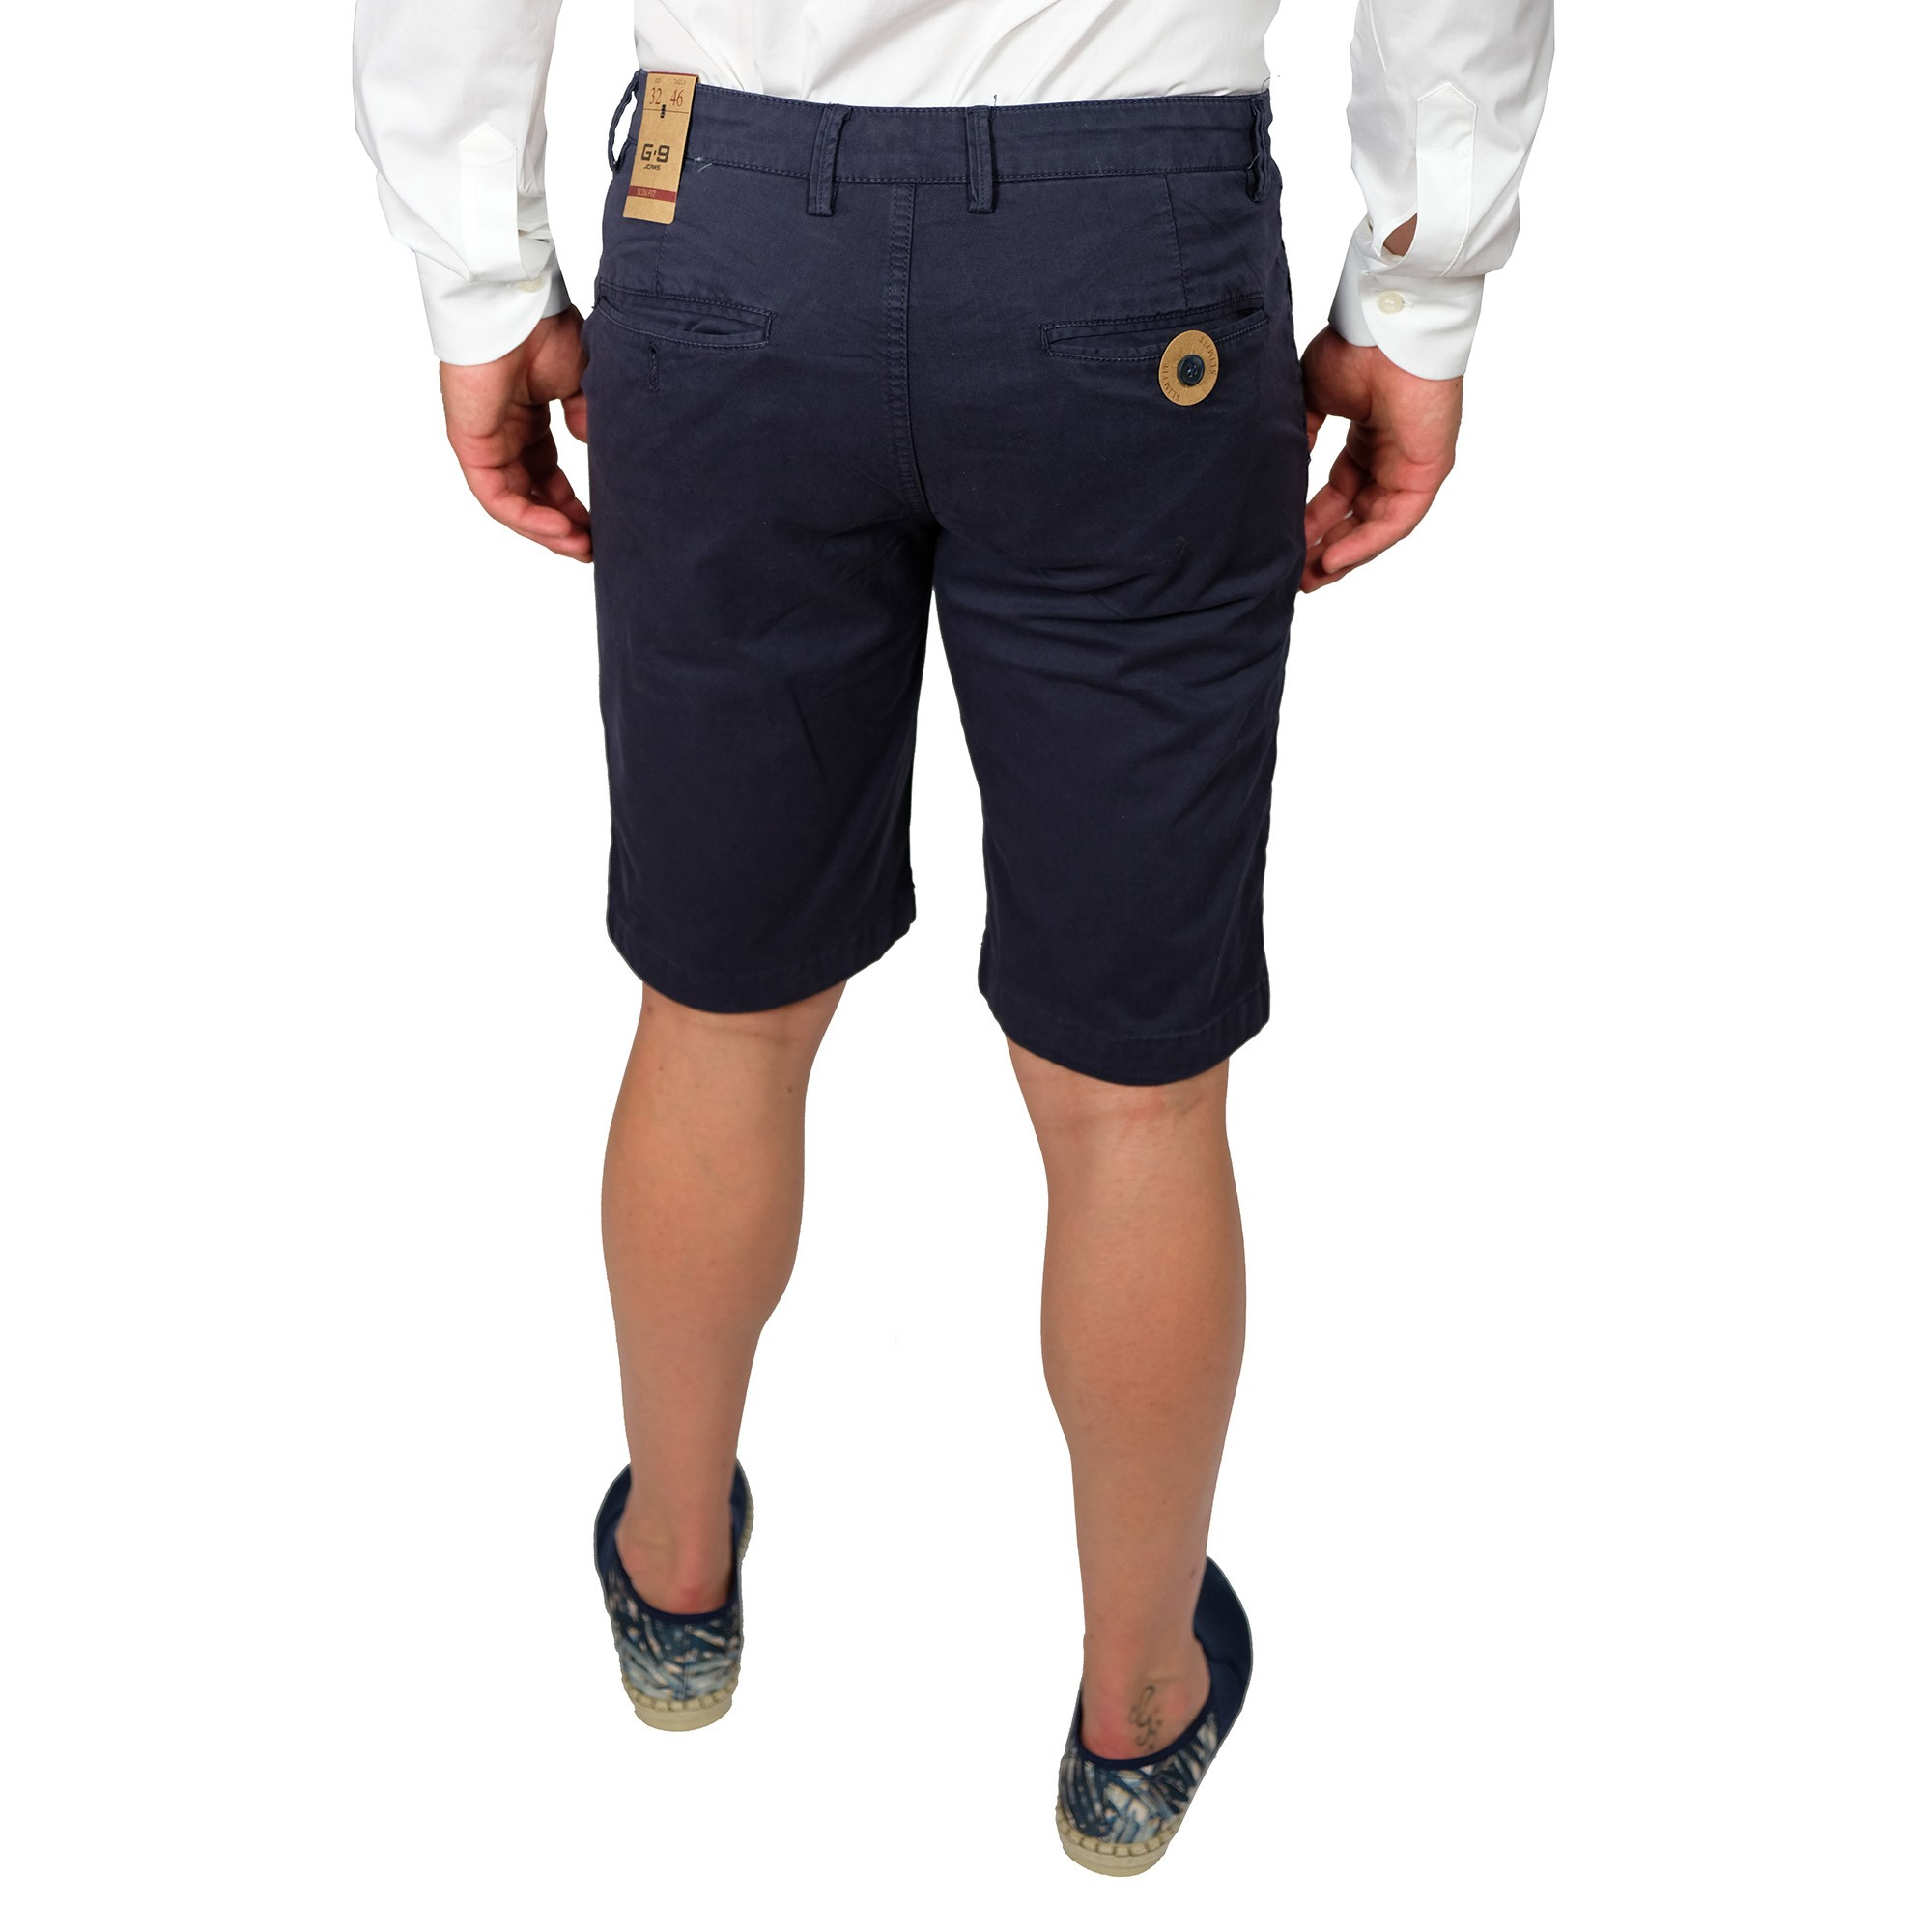 Bermuda-Uomo-Cotone-Jeans-Pantaloncini-Pantaloni-Corti-Tasca-America-Slim-Shorts miniatura 7